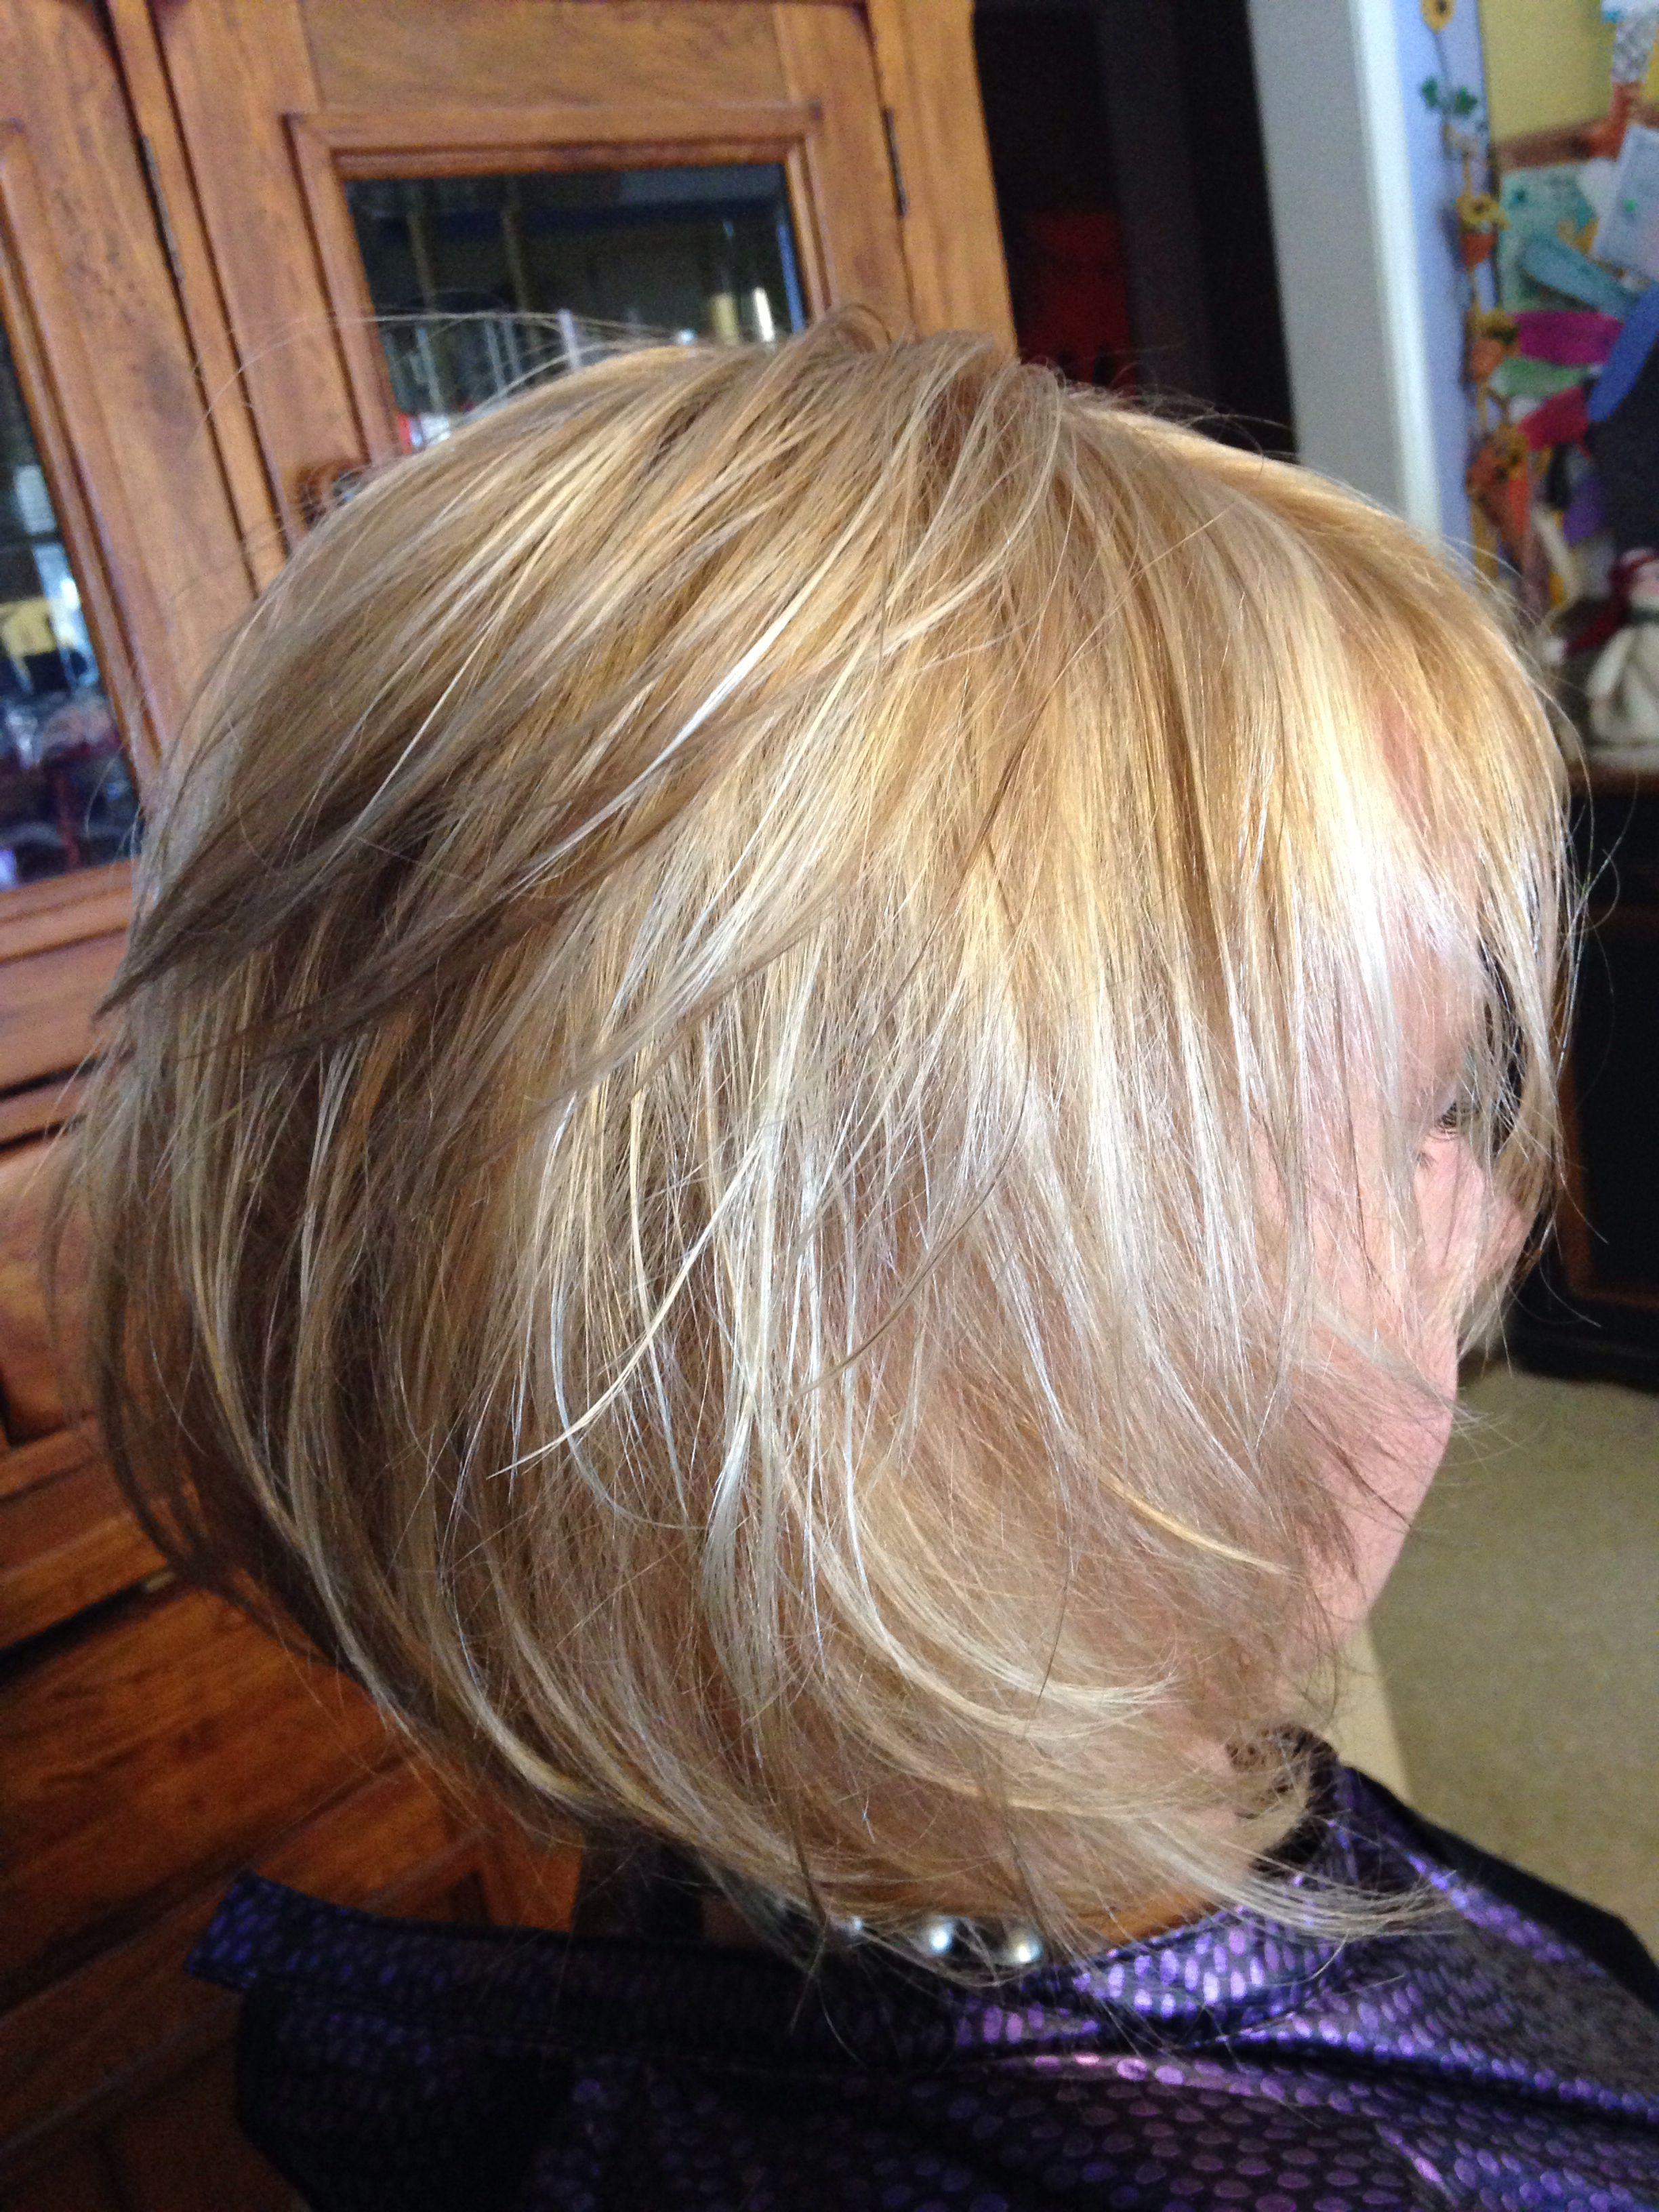 blonde on blonde razor cut hair | sara's hair creations